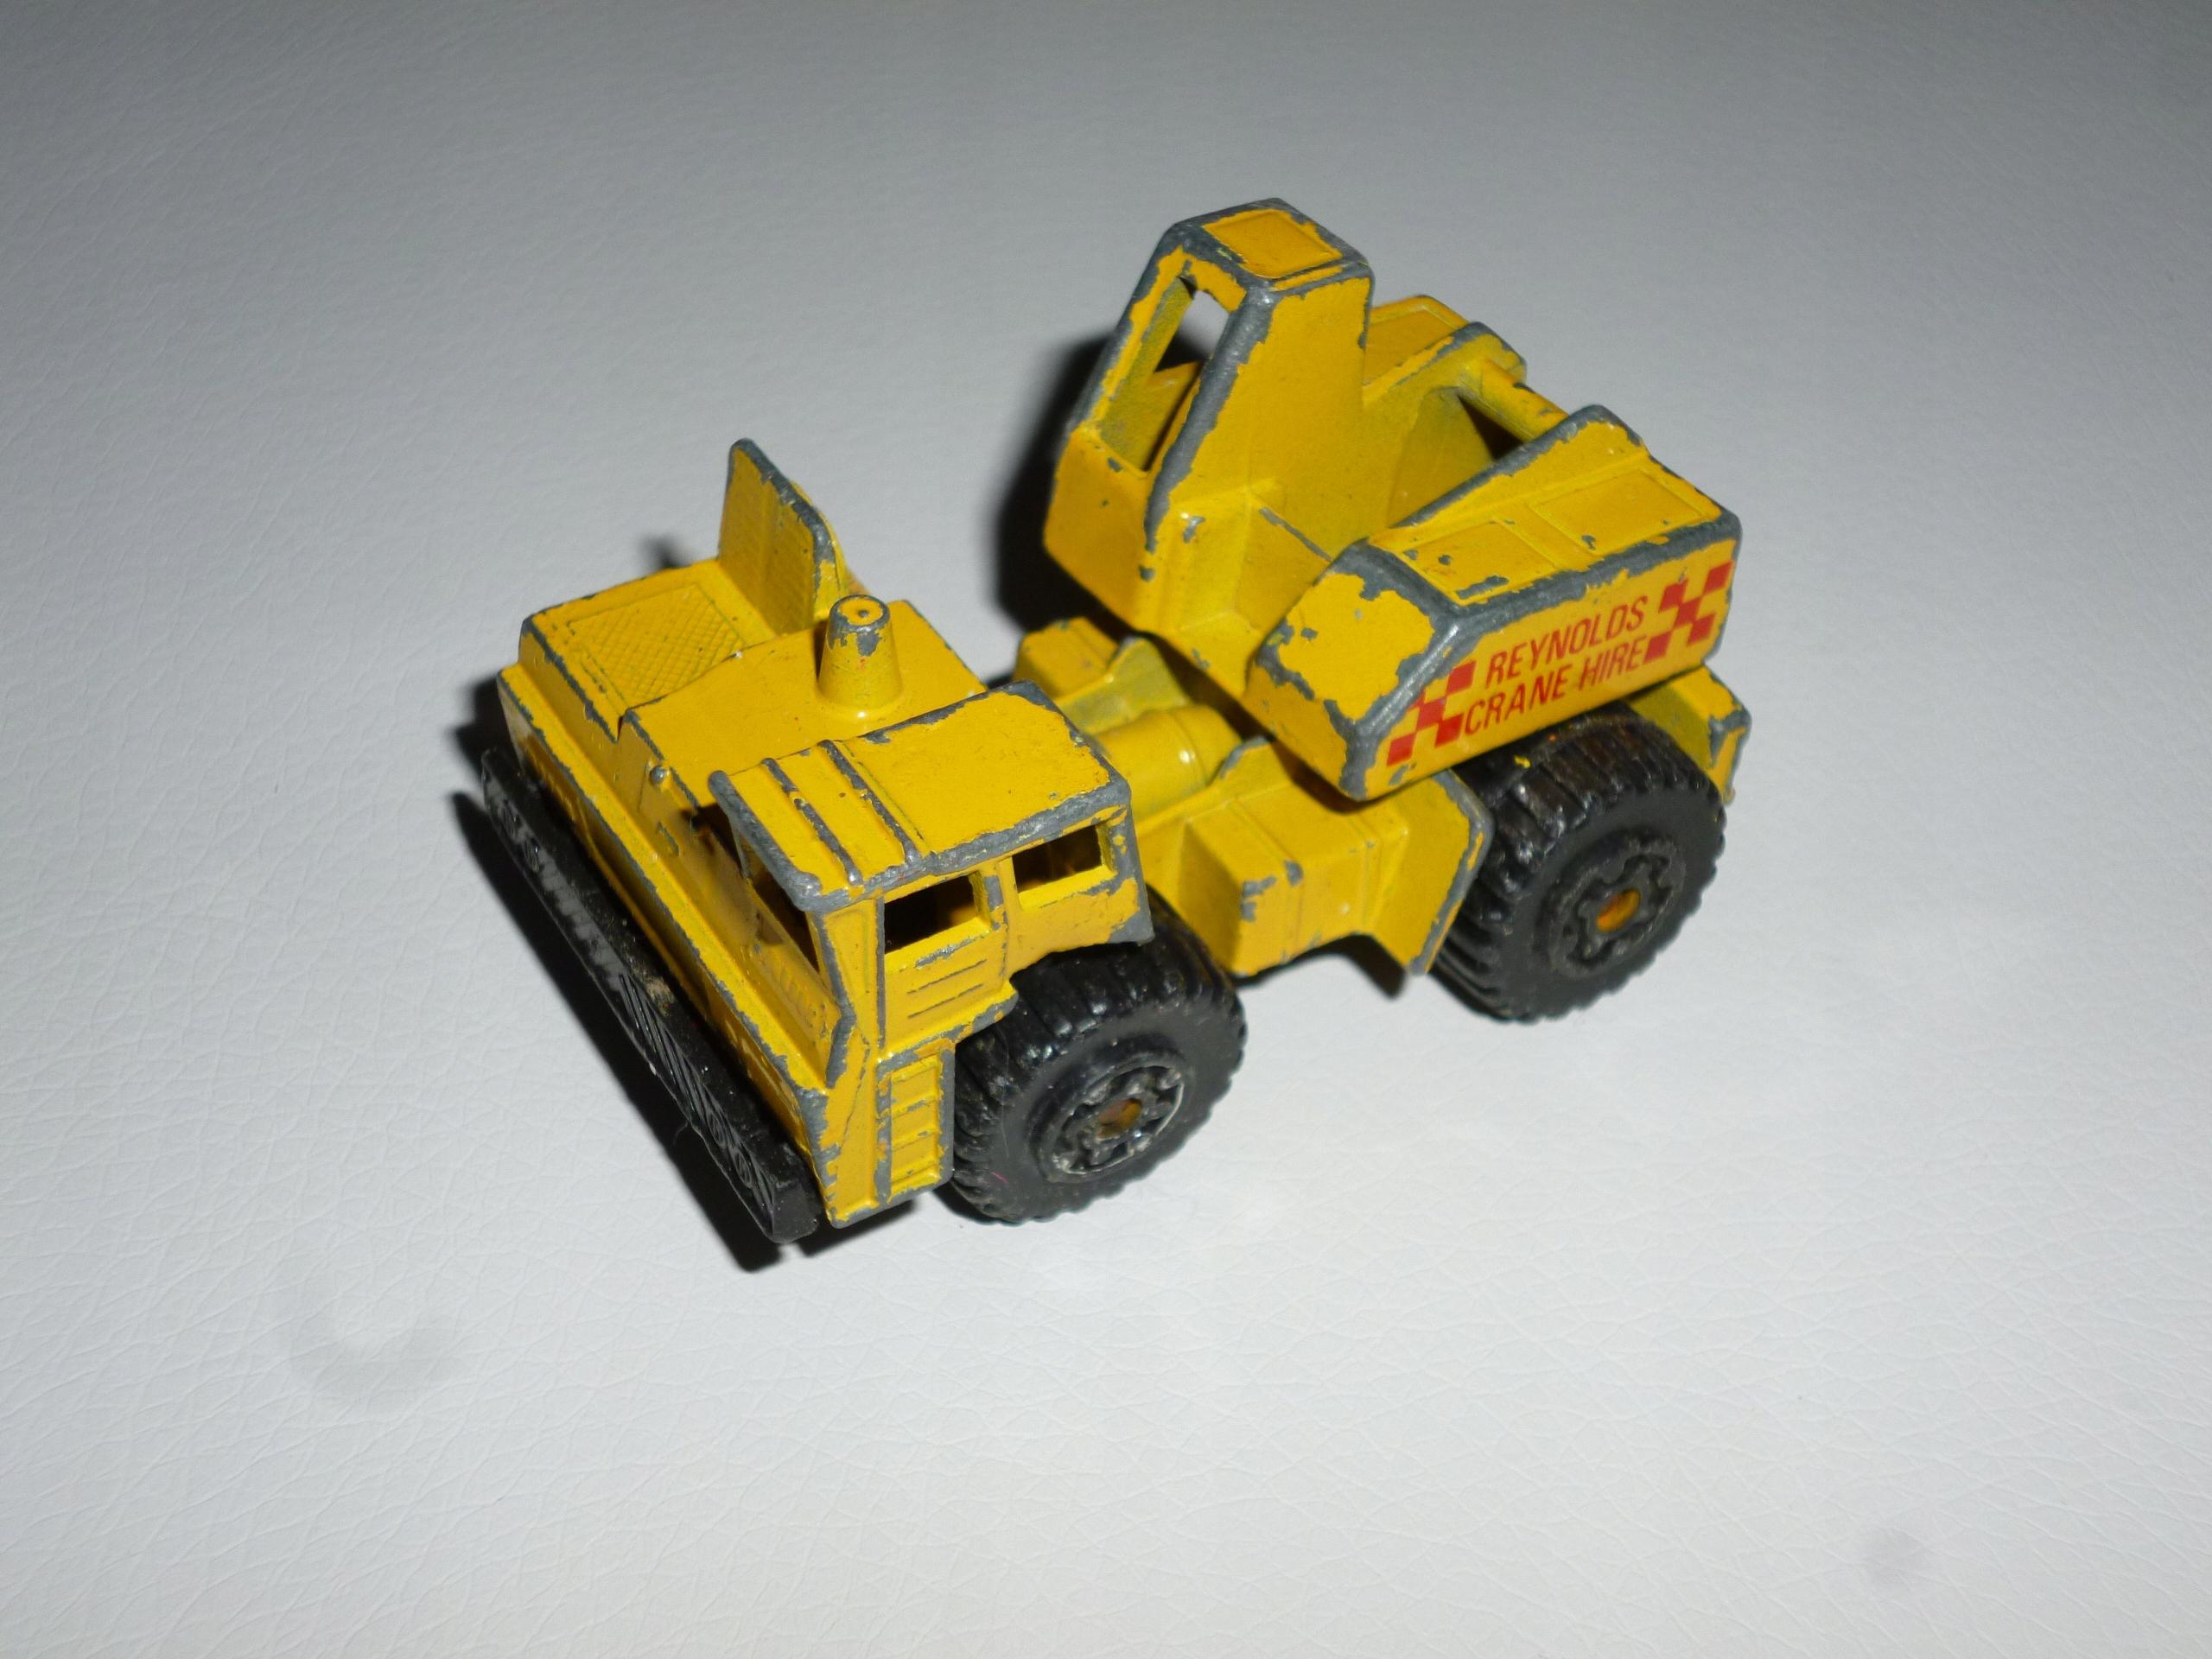 Mobile Crane 1984 Matchbox model resorak